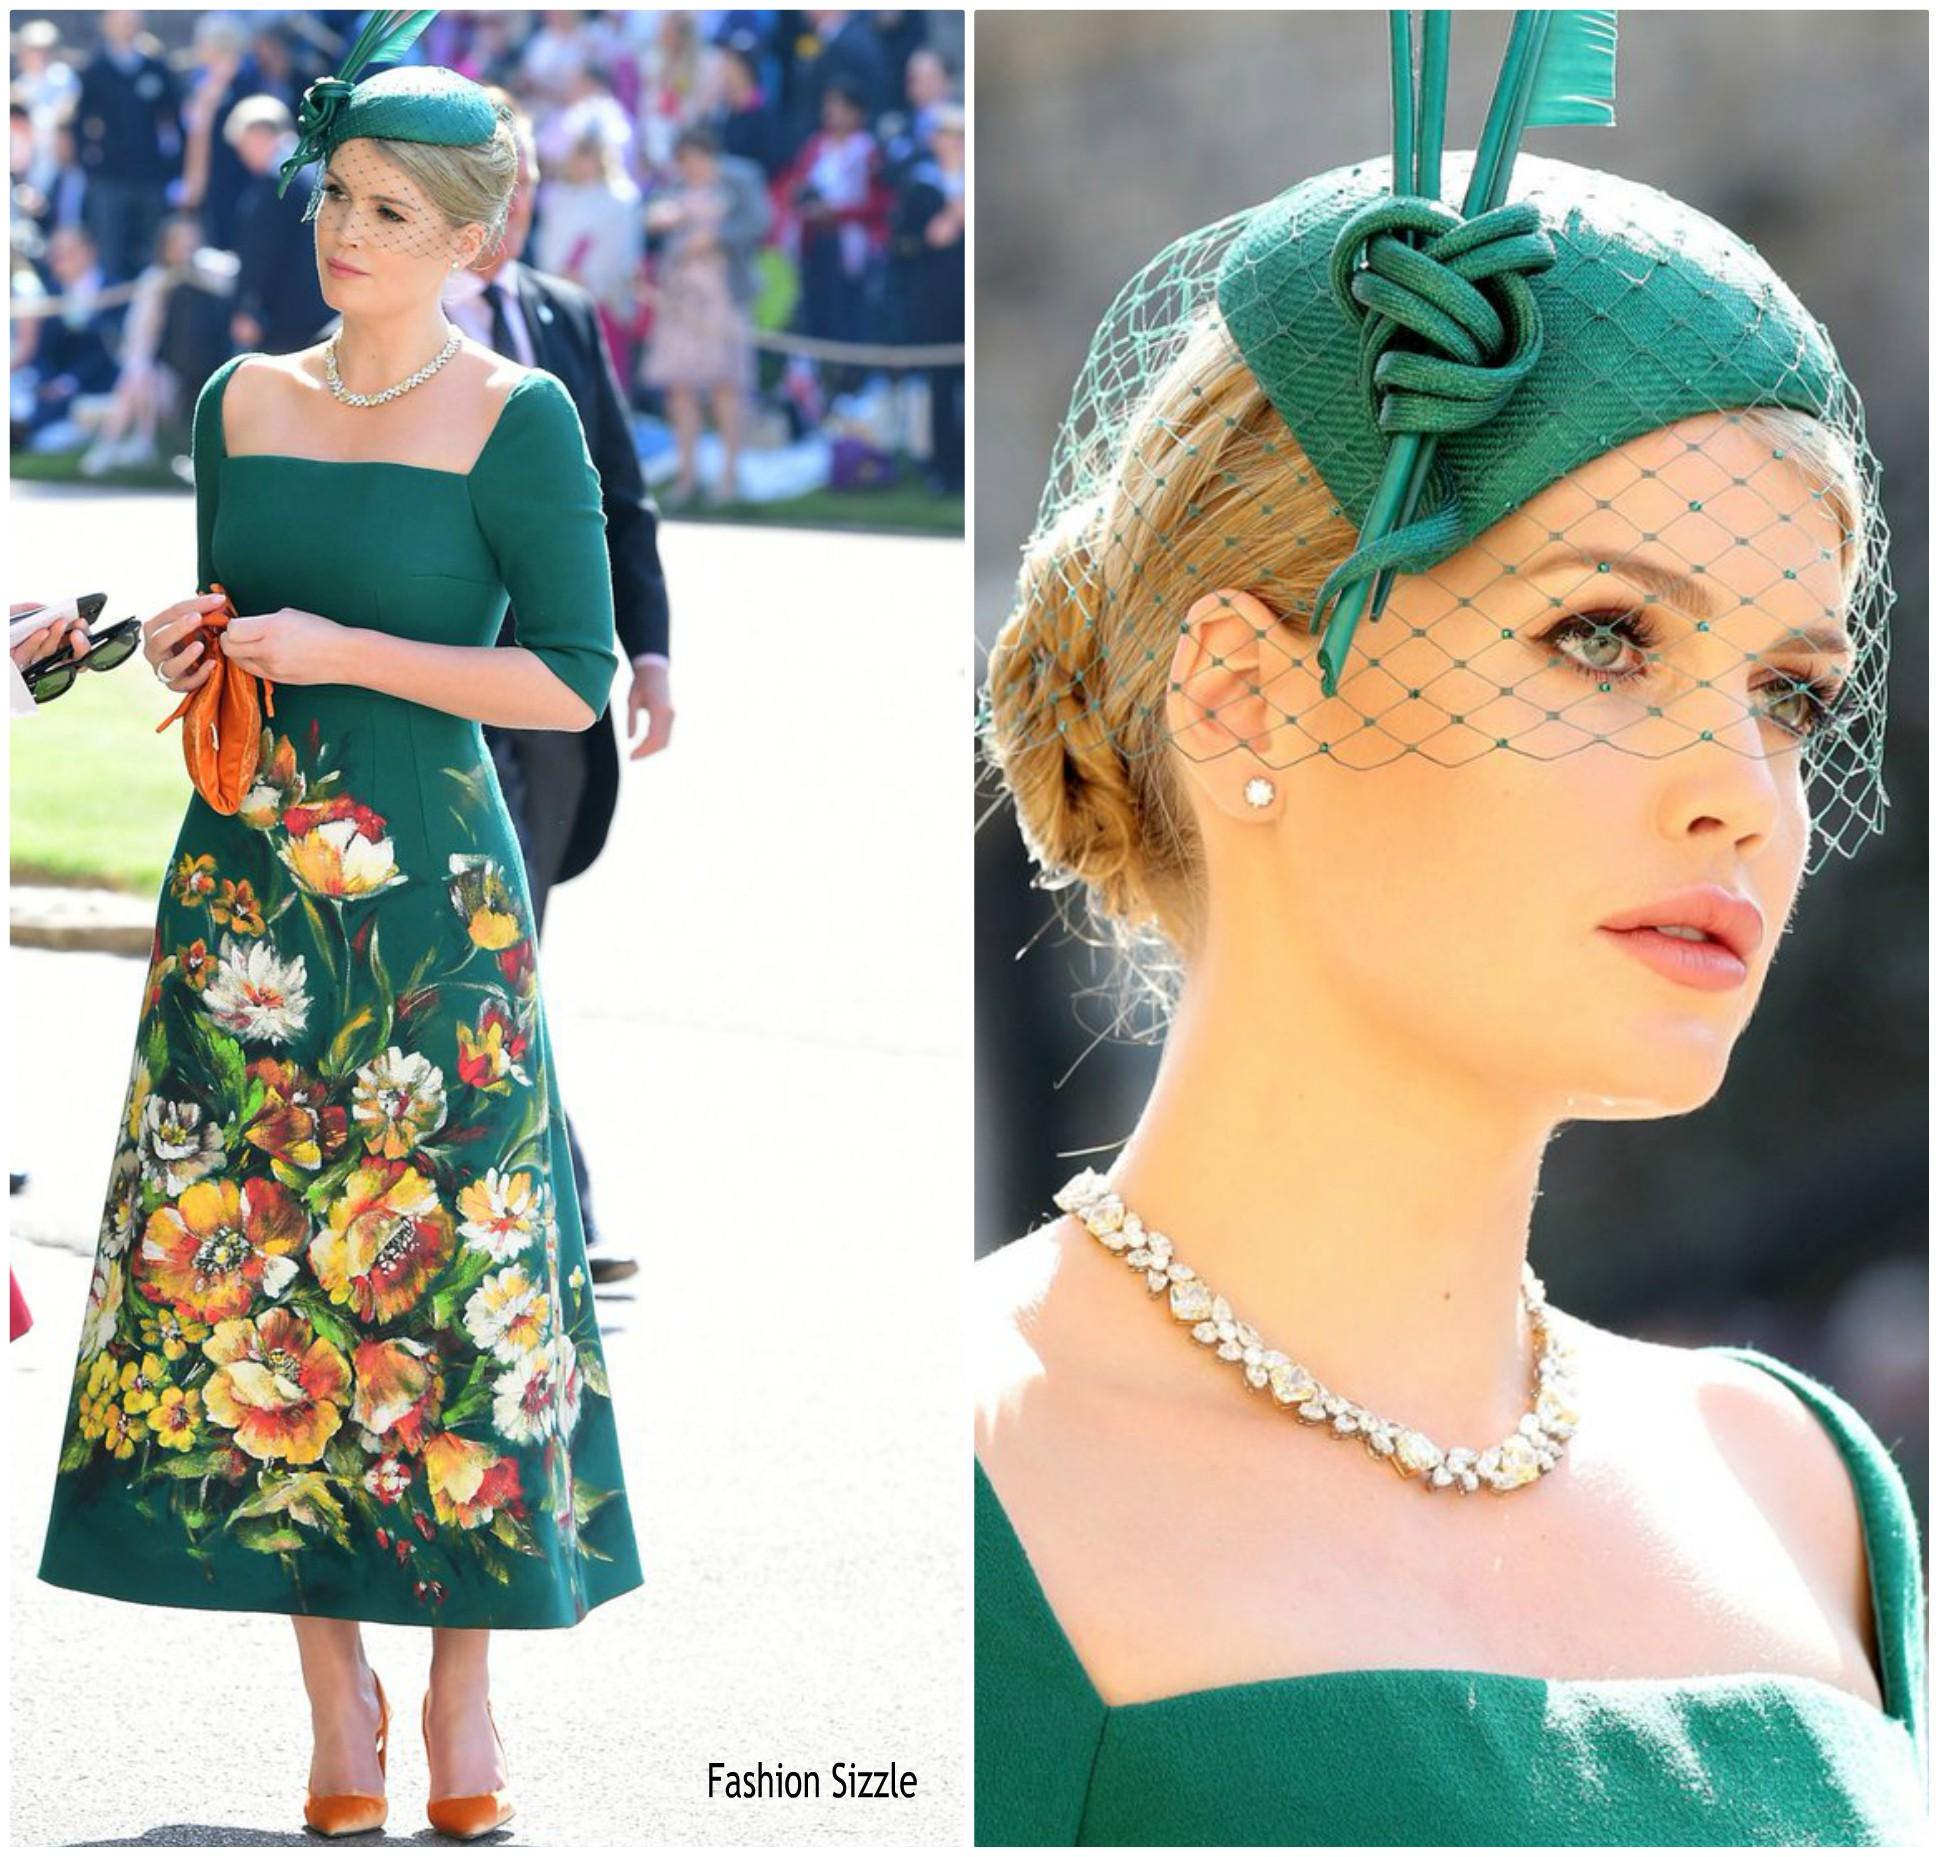 lady-kitty-in-dolce-gabbana-alta-moda-prince-harry-meghan-markles-royal-wedding (1)